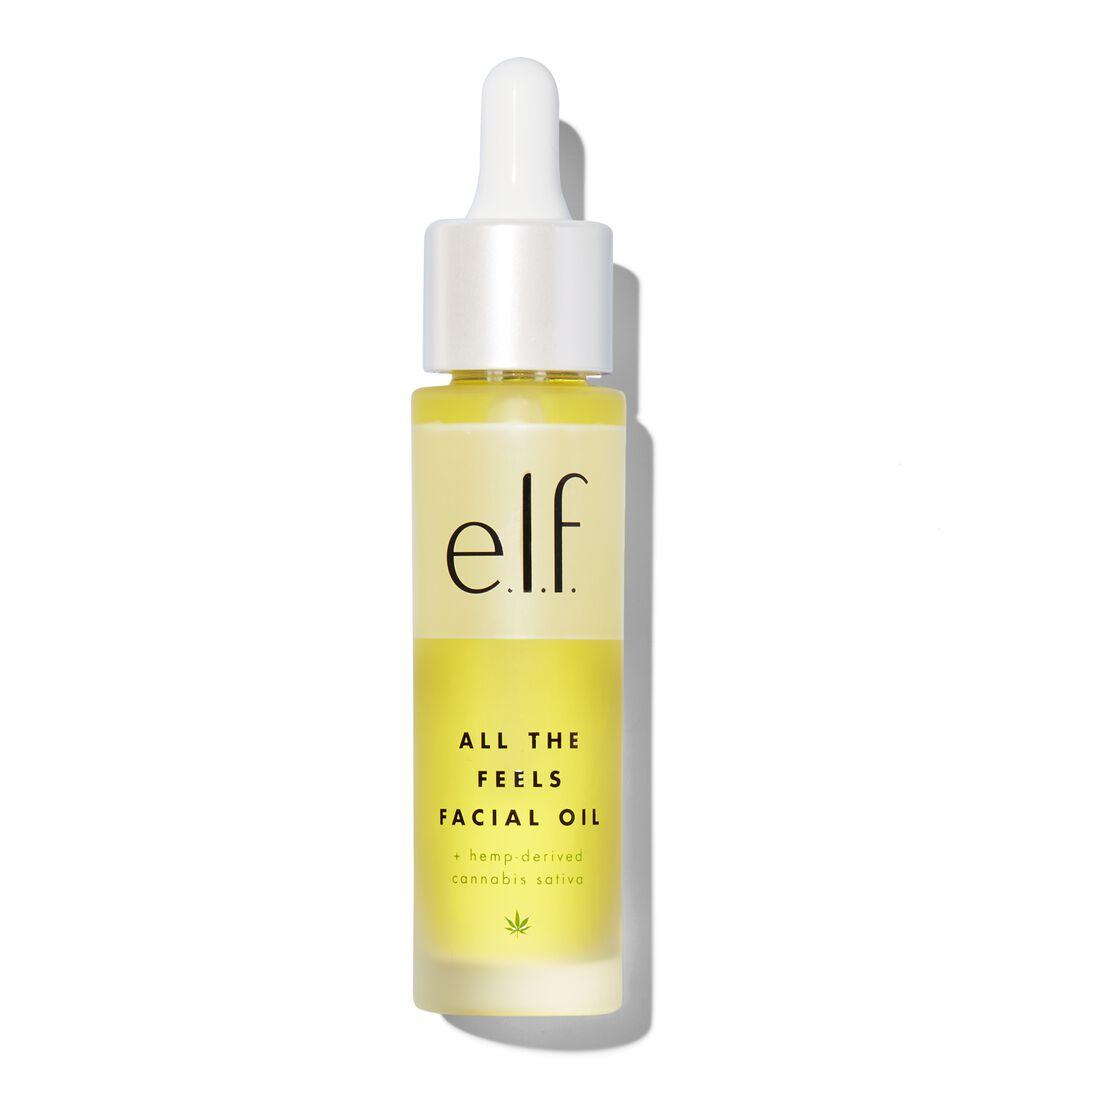 E.l.f Cosmetics - All the Feels Facial Oil